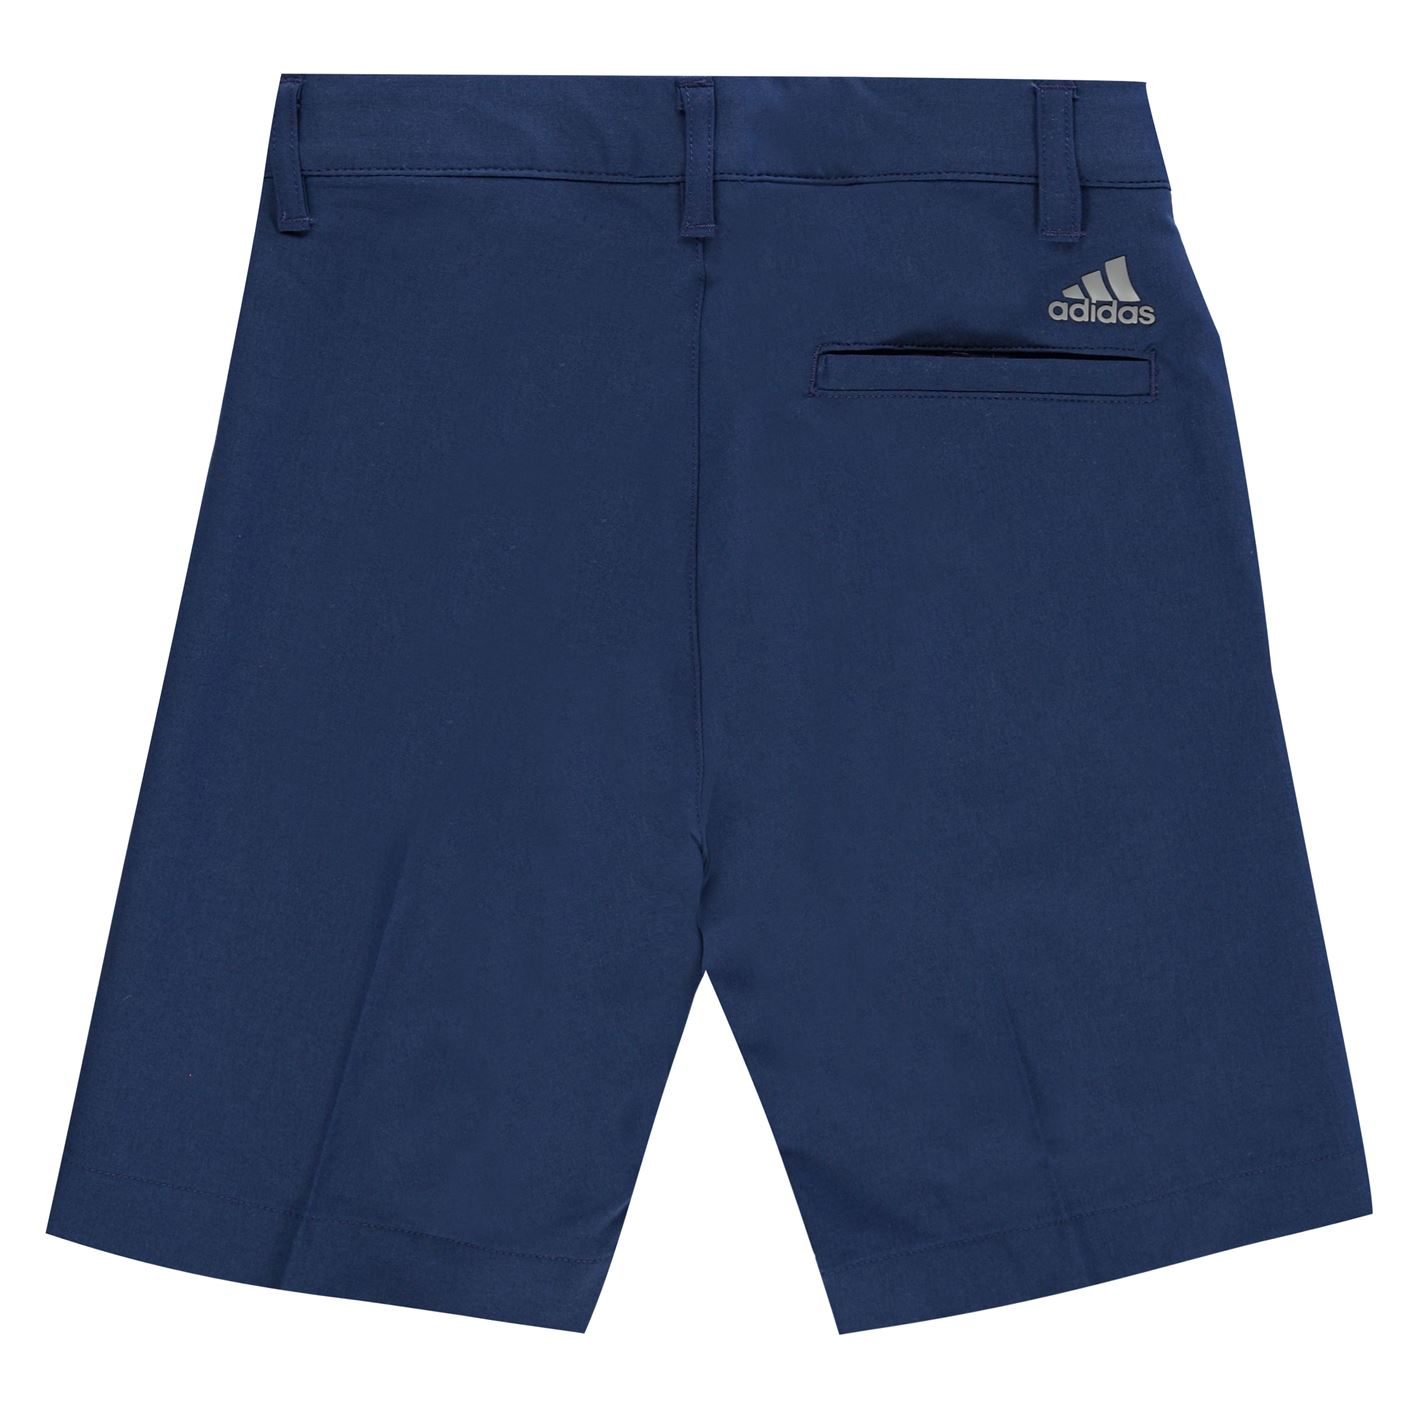 Sort golf adidas pentru baietei bleumarin